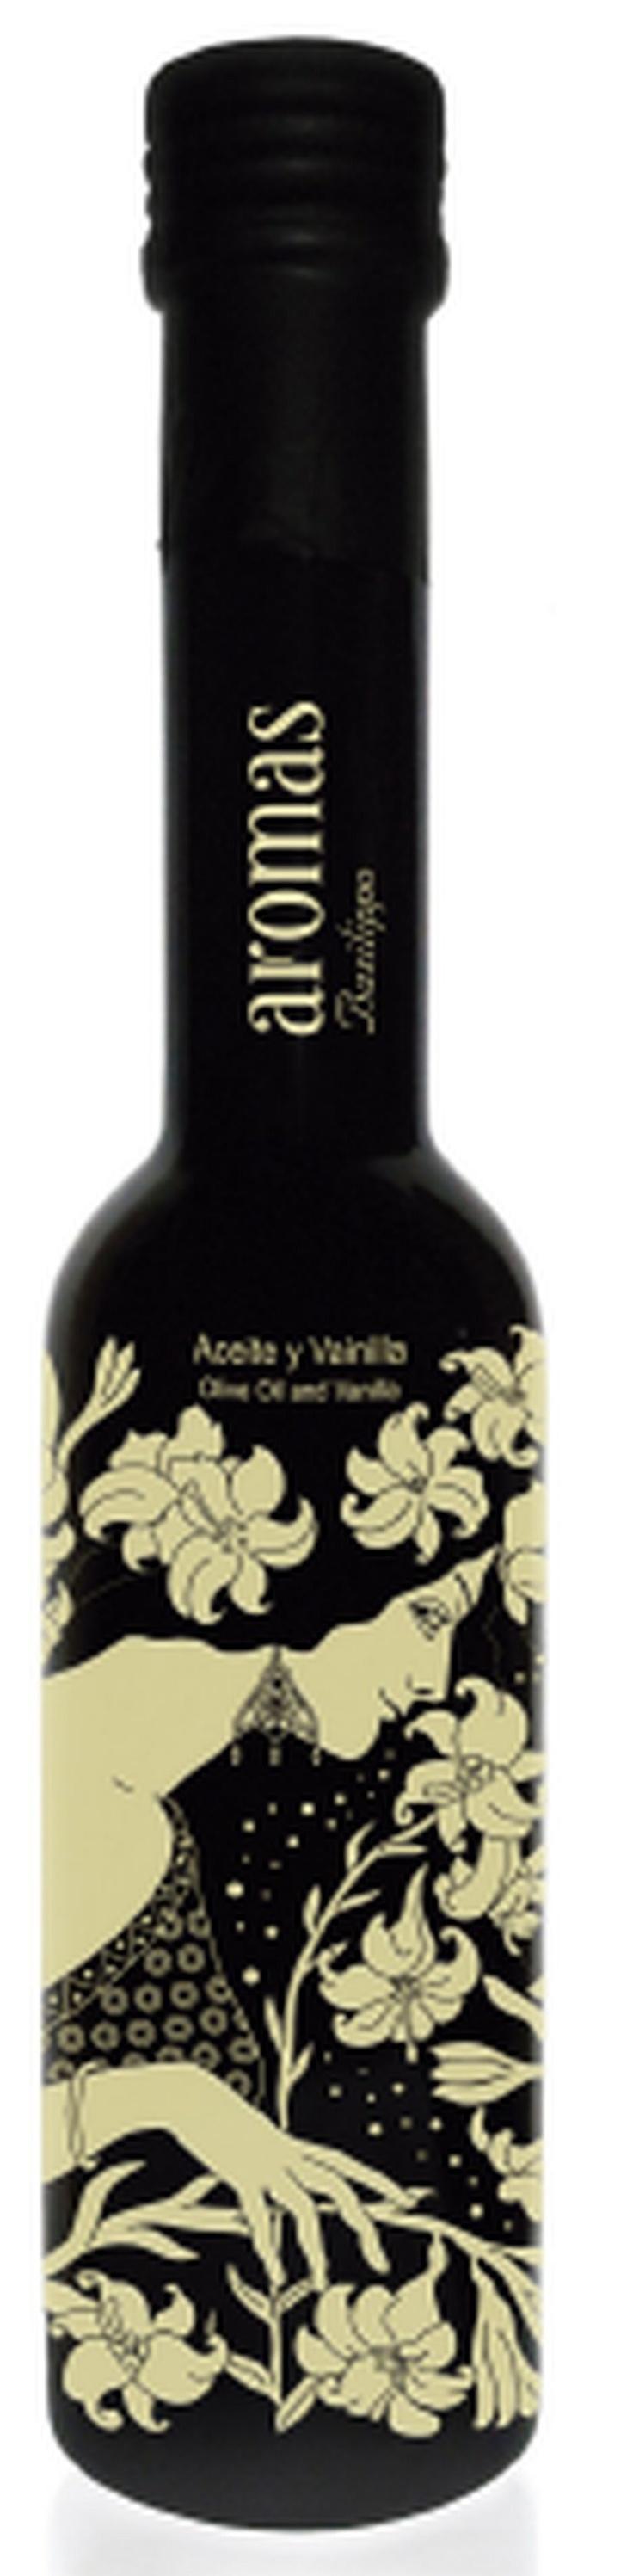 Basilippo Aceite de Vainilla. (250 ml). #AOVE #EVOO #marenostrumgourmet #marenostrumgold